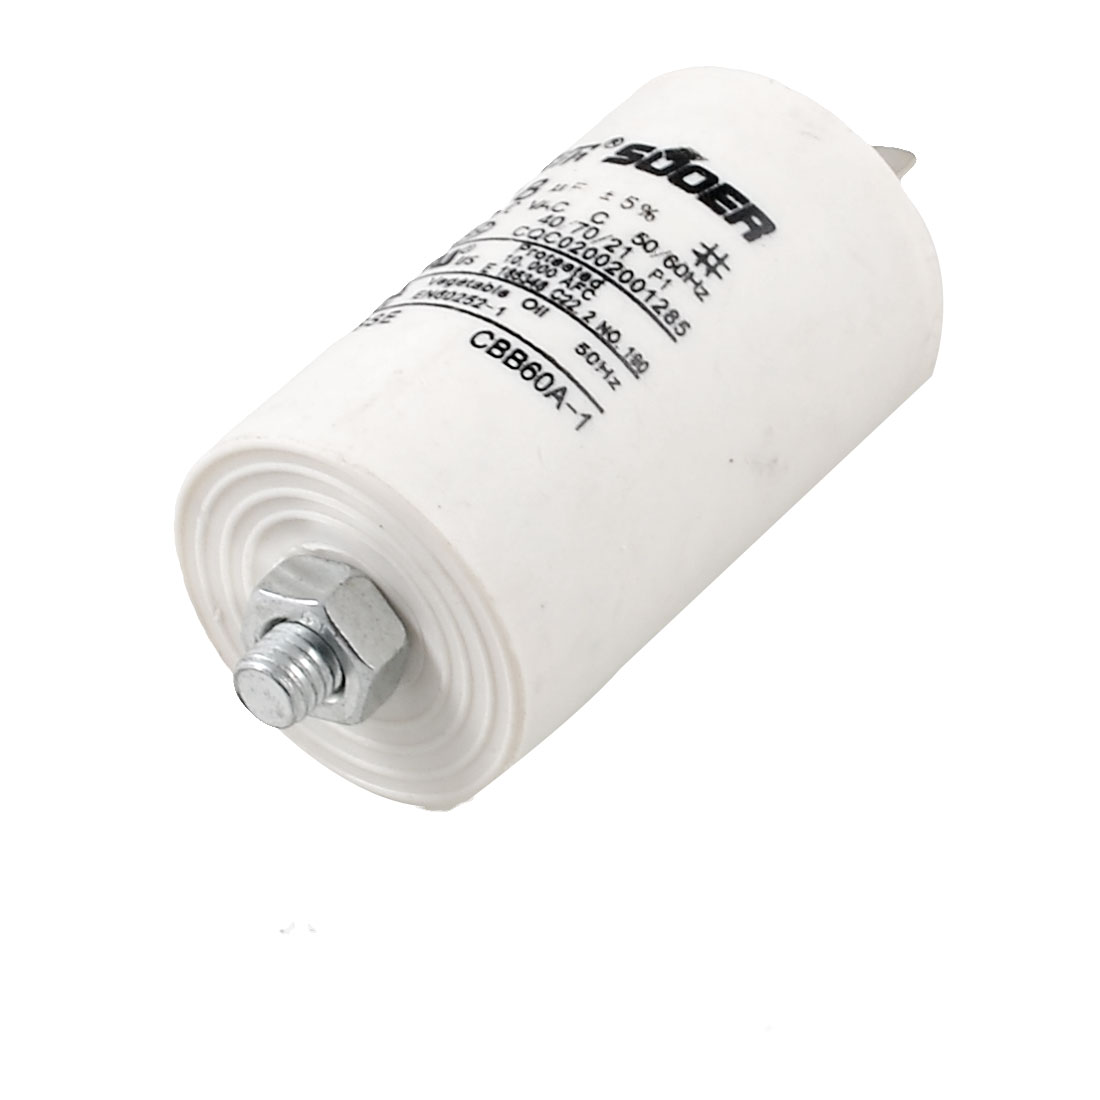 CBB60A-1 Polypropylene Film AC 450V 18UF Motor Run Capacitor for Washing Machine